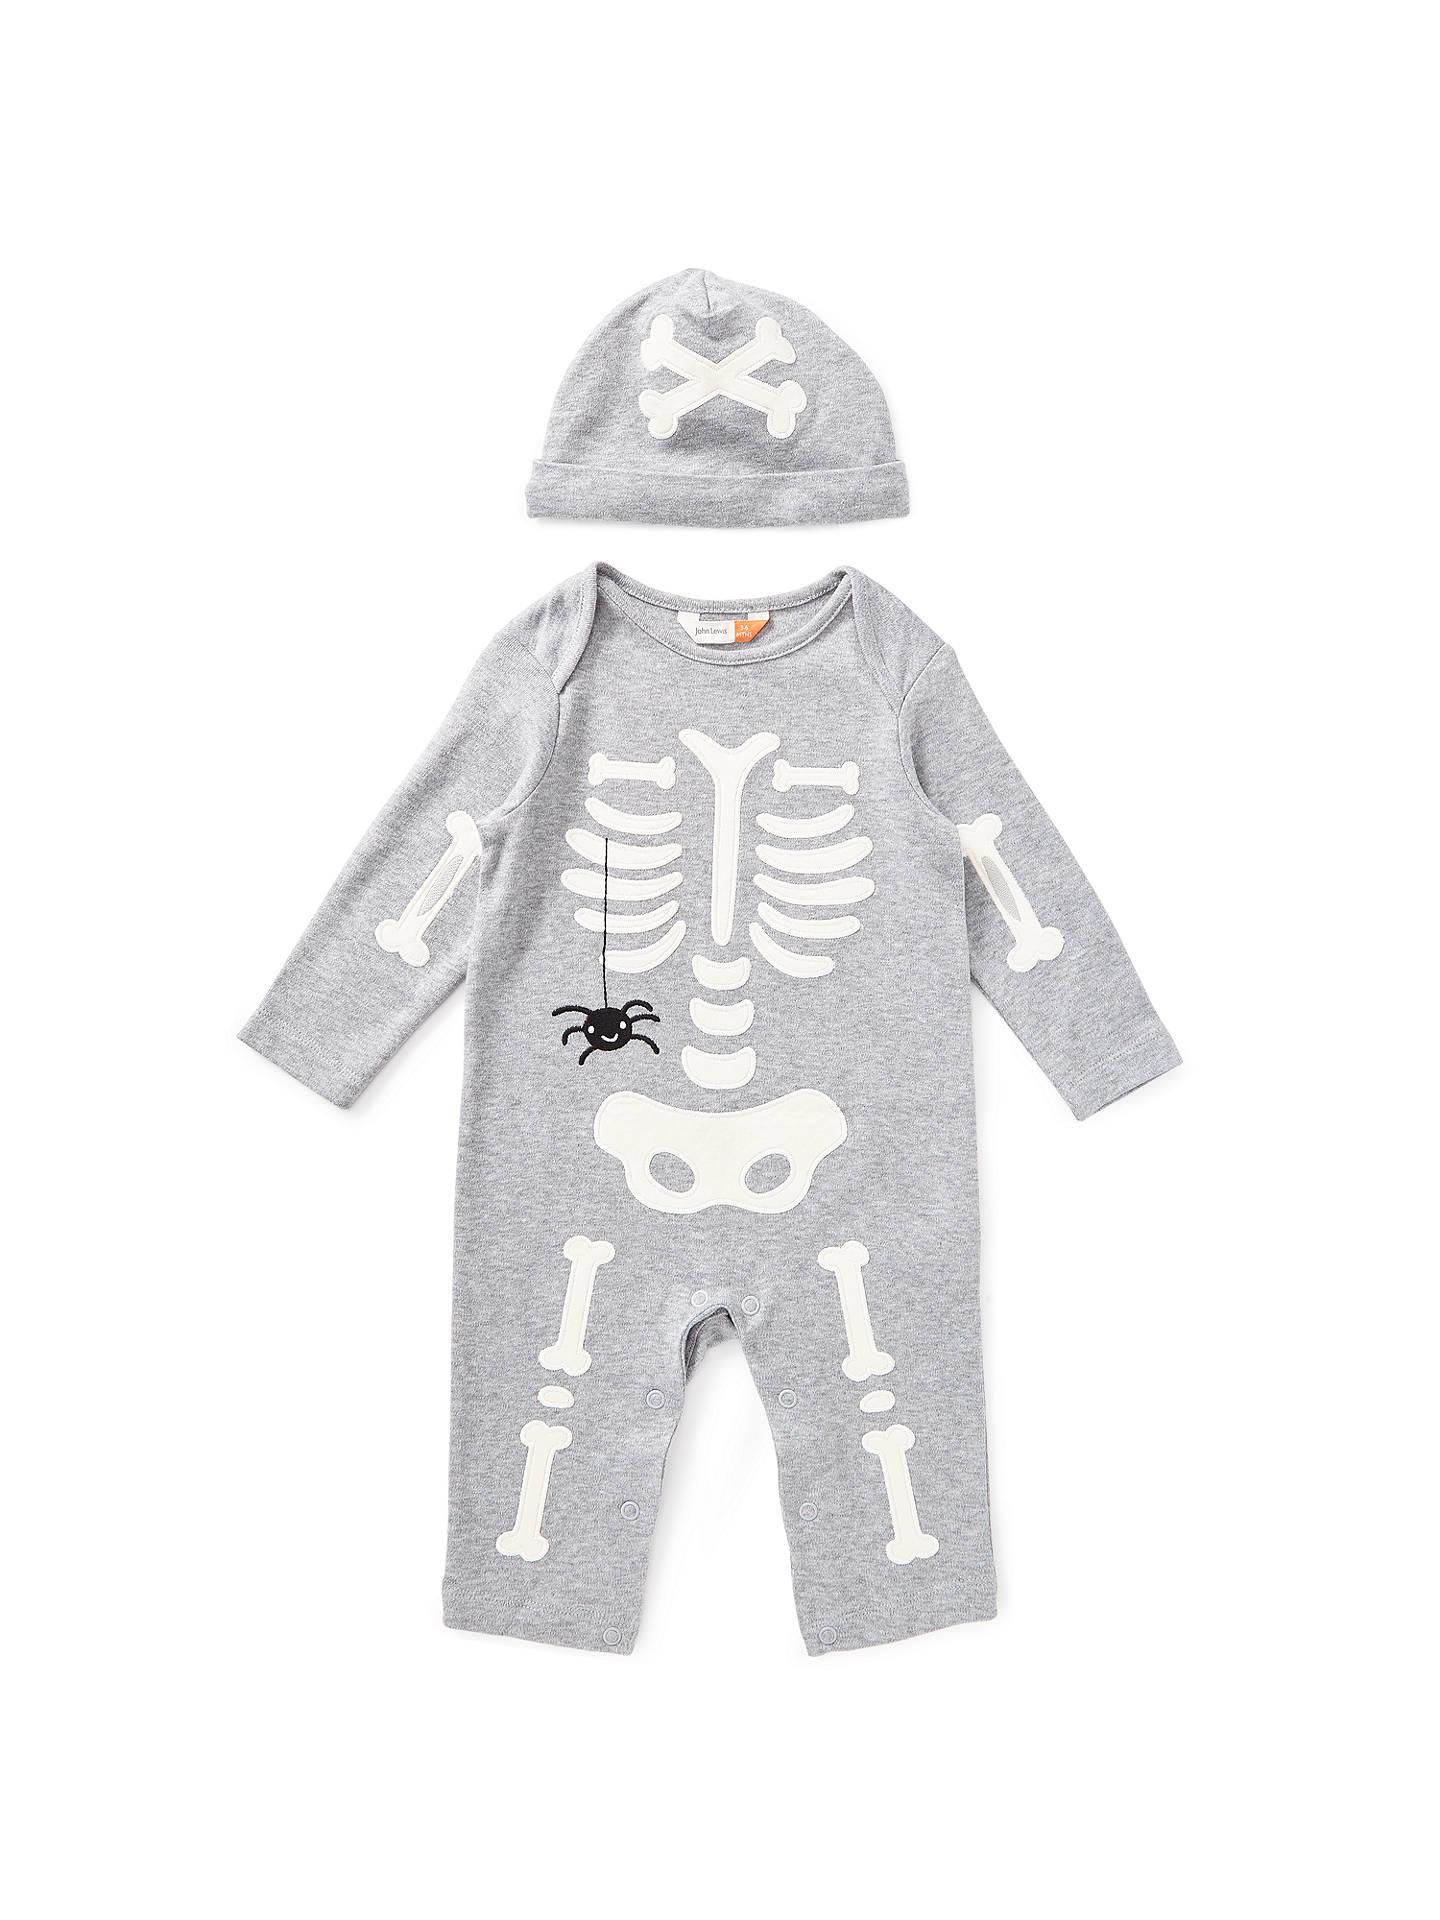 aa432cda4522 John Lewis   Partners Baby Skeleton Romper and Hat